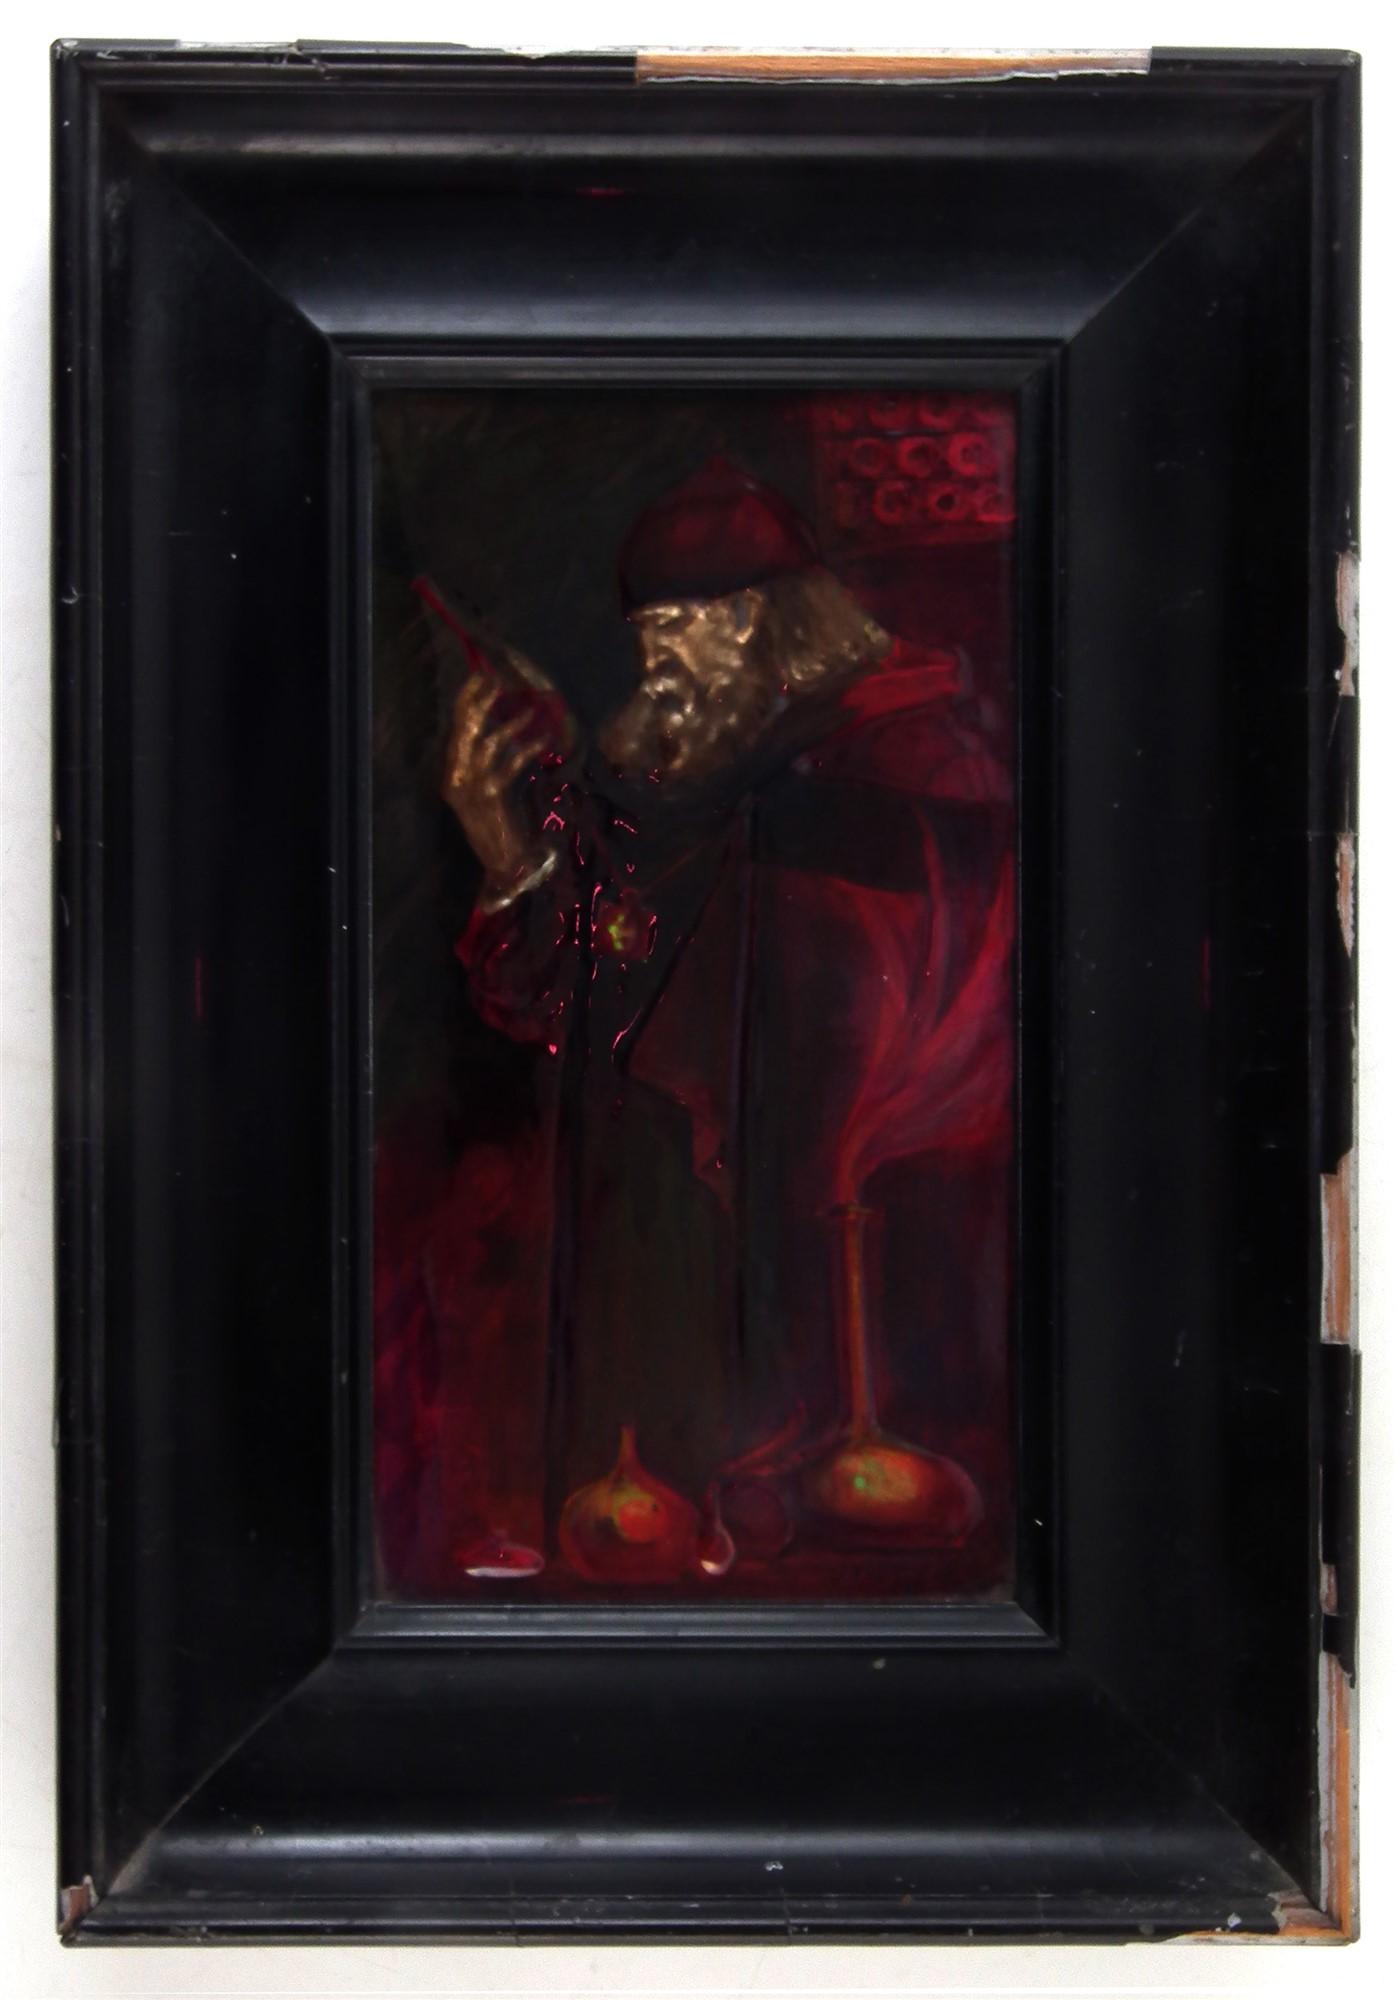 Lot 84 - 'The Alchemist' flambé plaque by Royal Doulton Art Director Charles Noke, depicting a robed figure